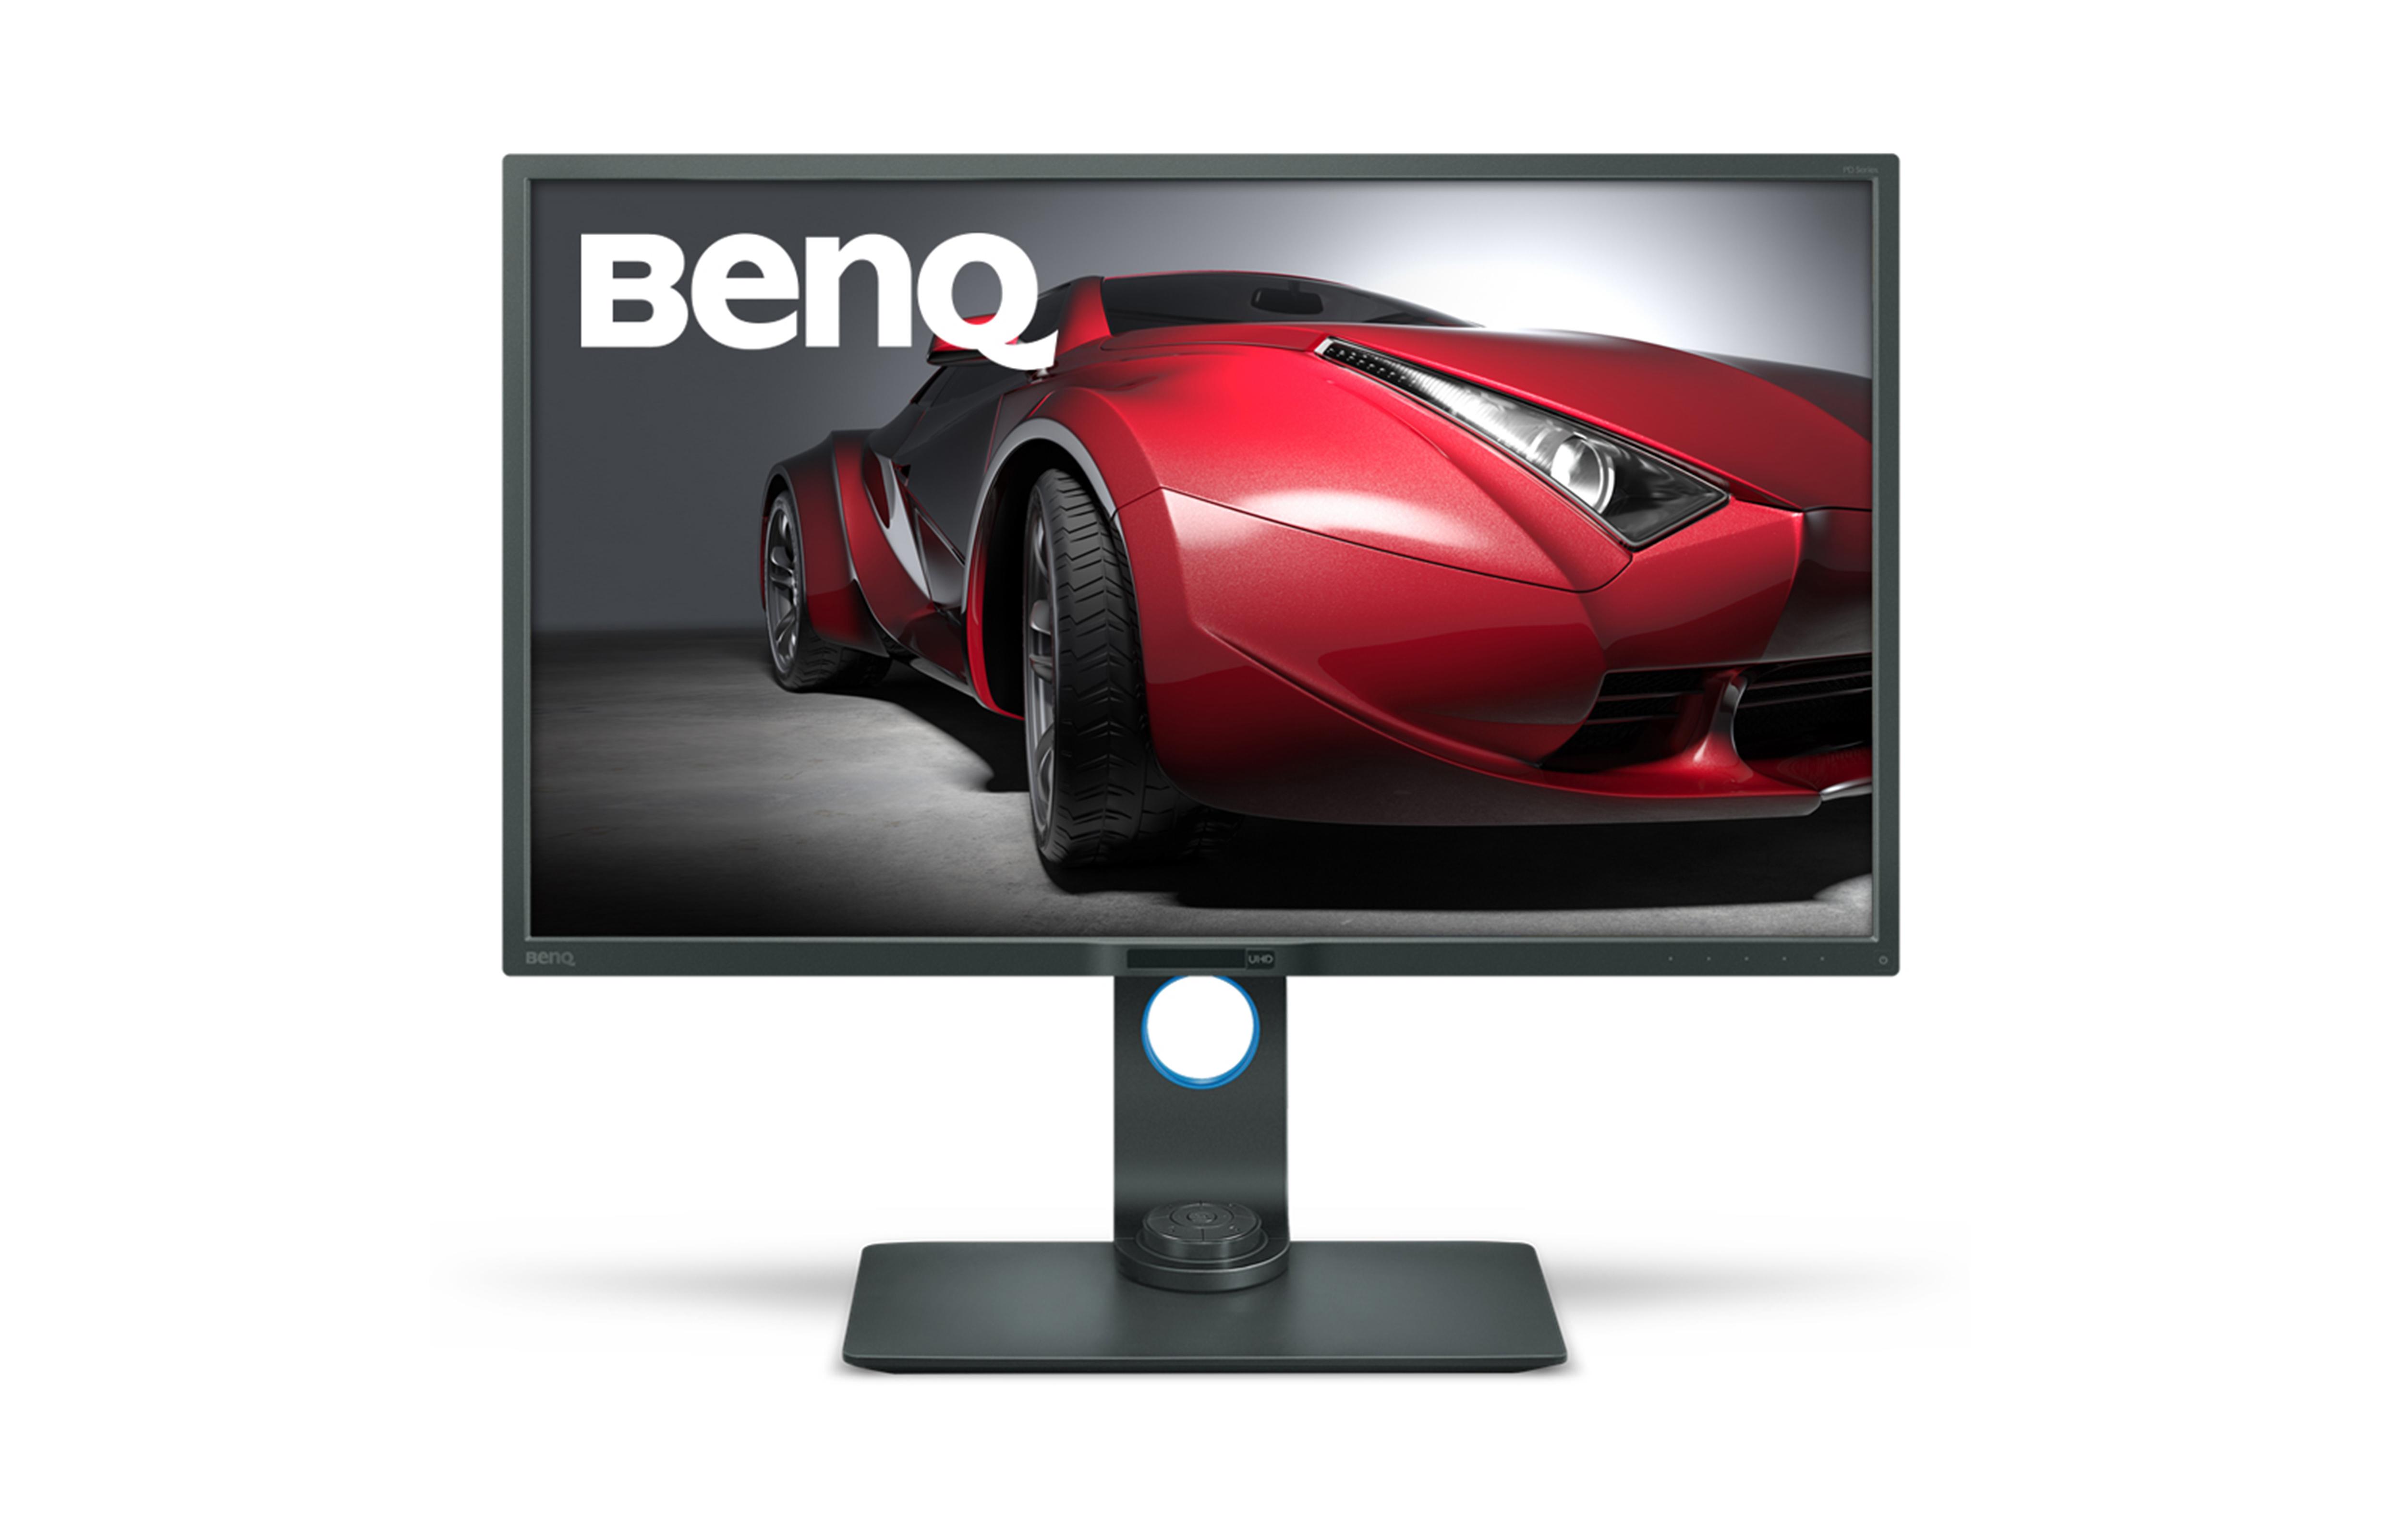 BenQ LCD PD3200U 32'' wide/IPS LED/4K 3840x2160/4ms/HDMI/DP/mDP/repro/pivot/Flicker-free/Low Blue Light